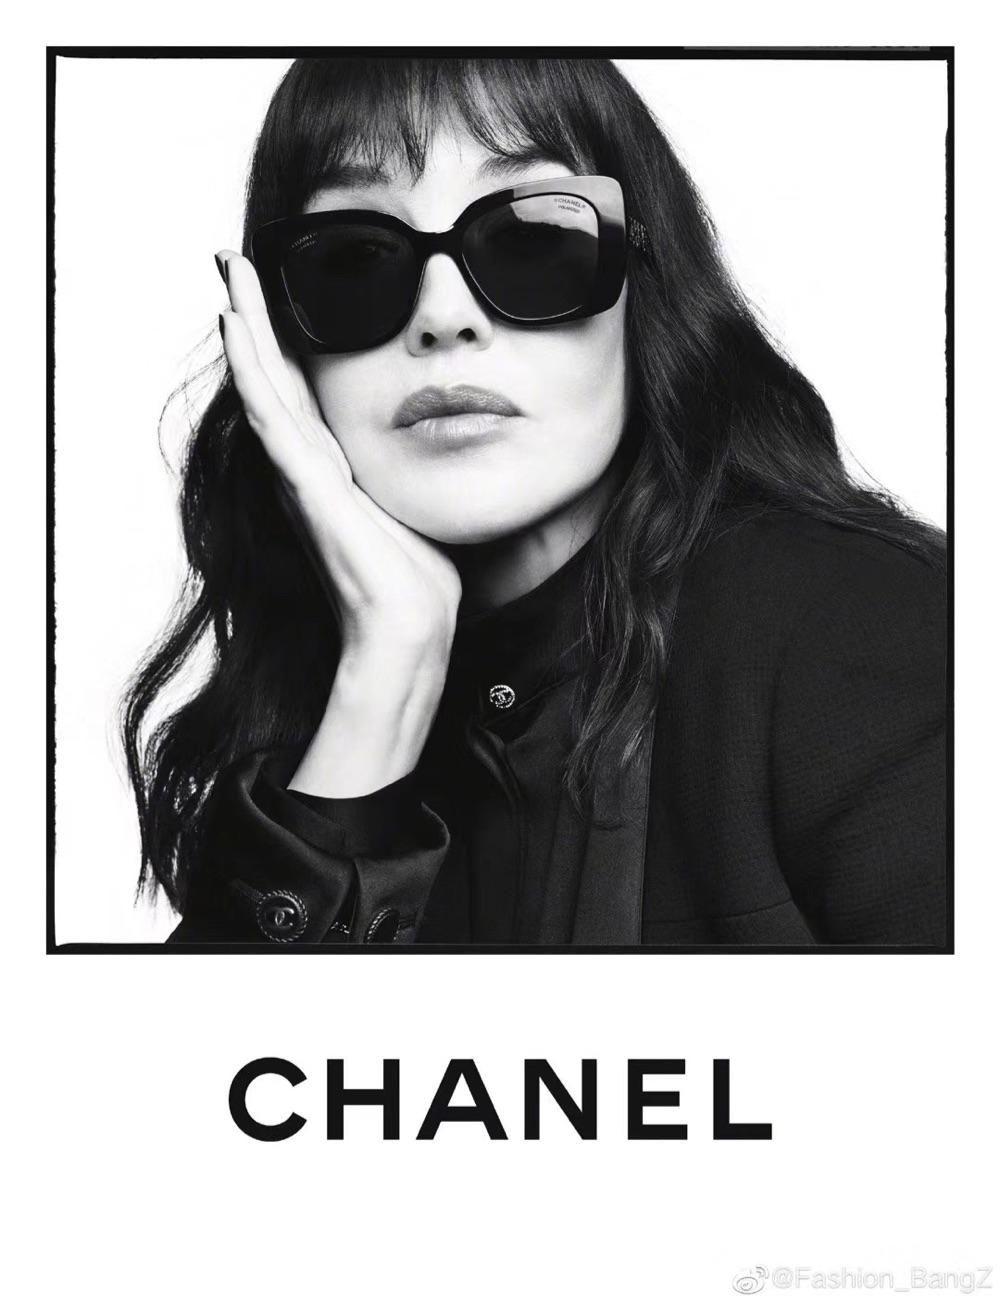 Chanel香奈儿2020爆款海报款水晶镂空腿明星同款墨镜 多色